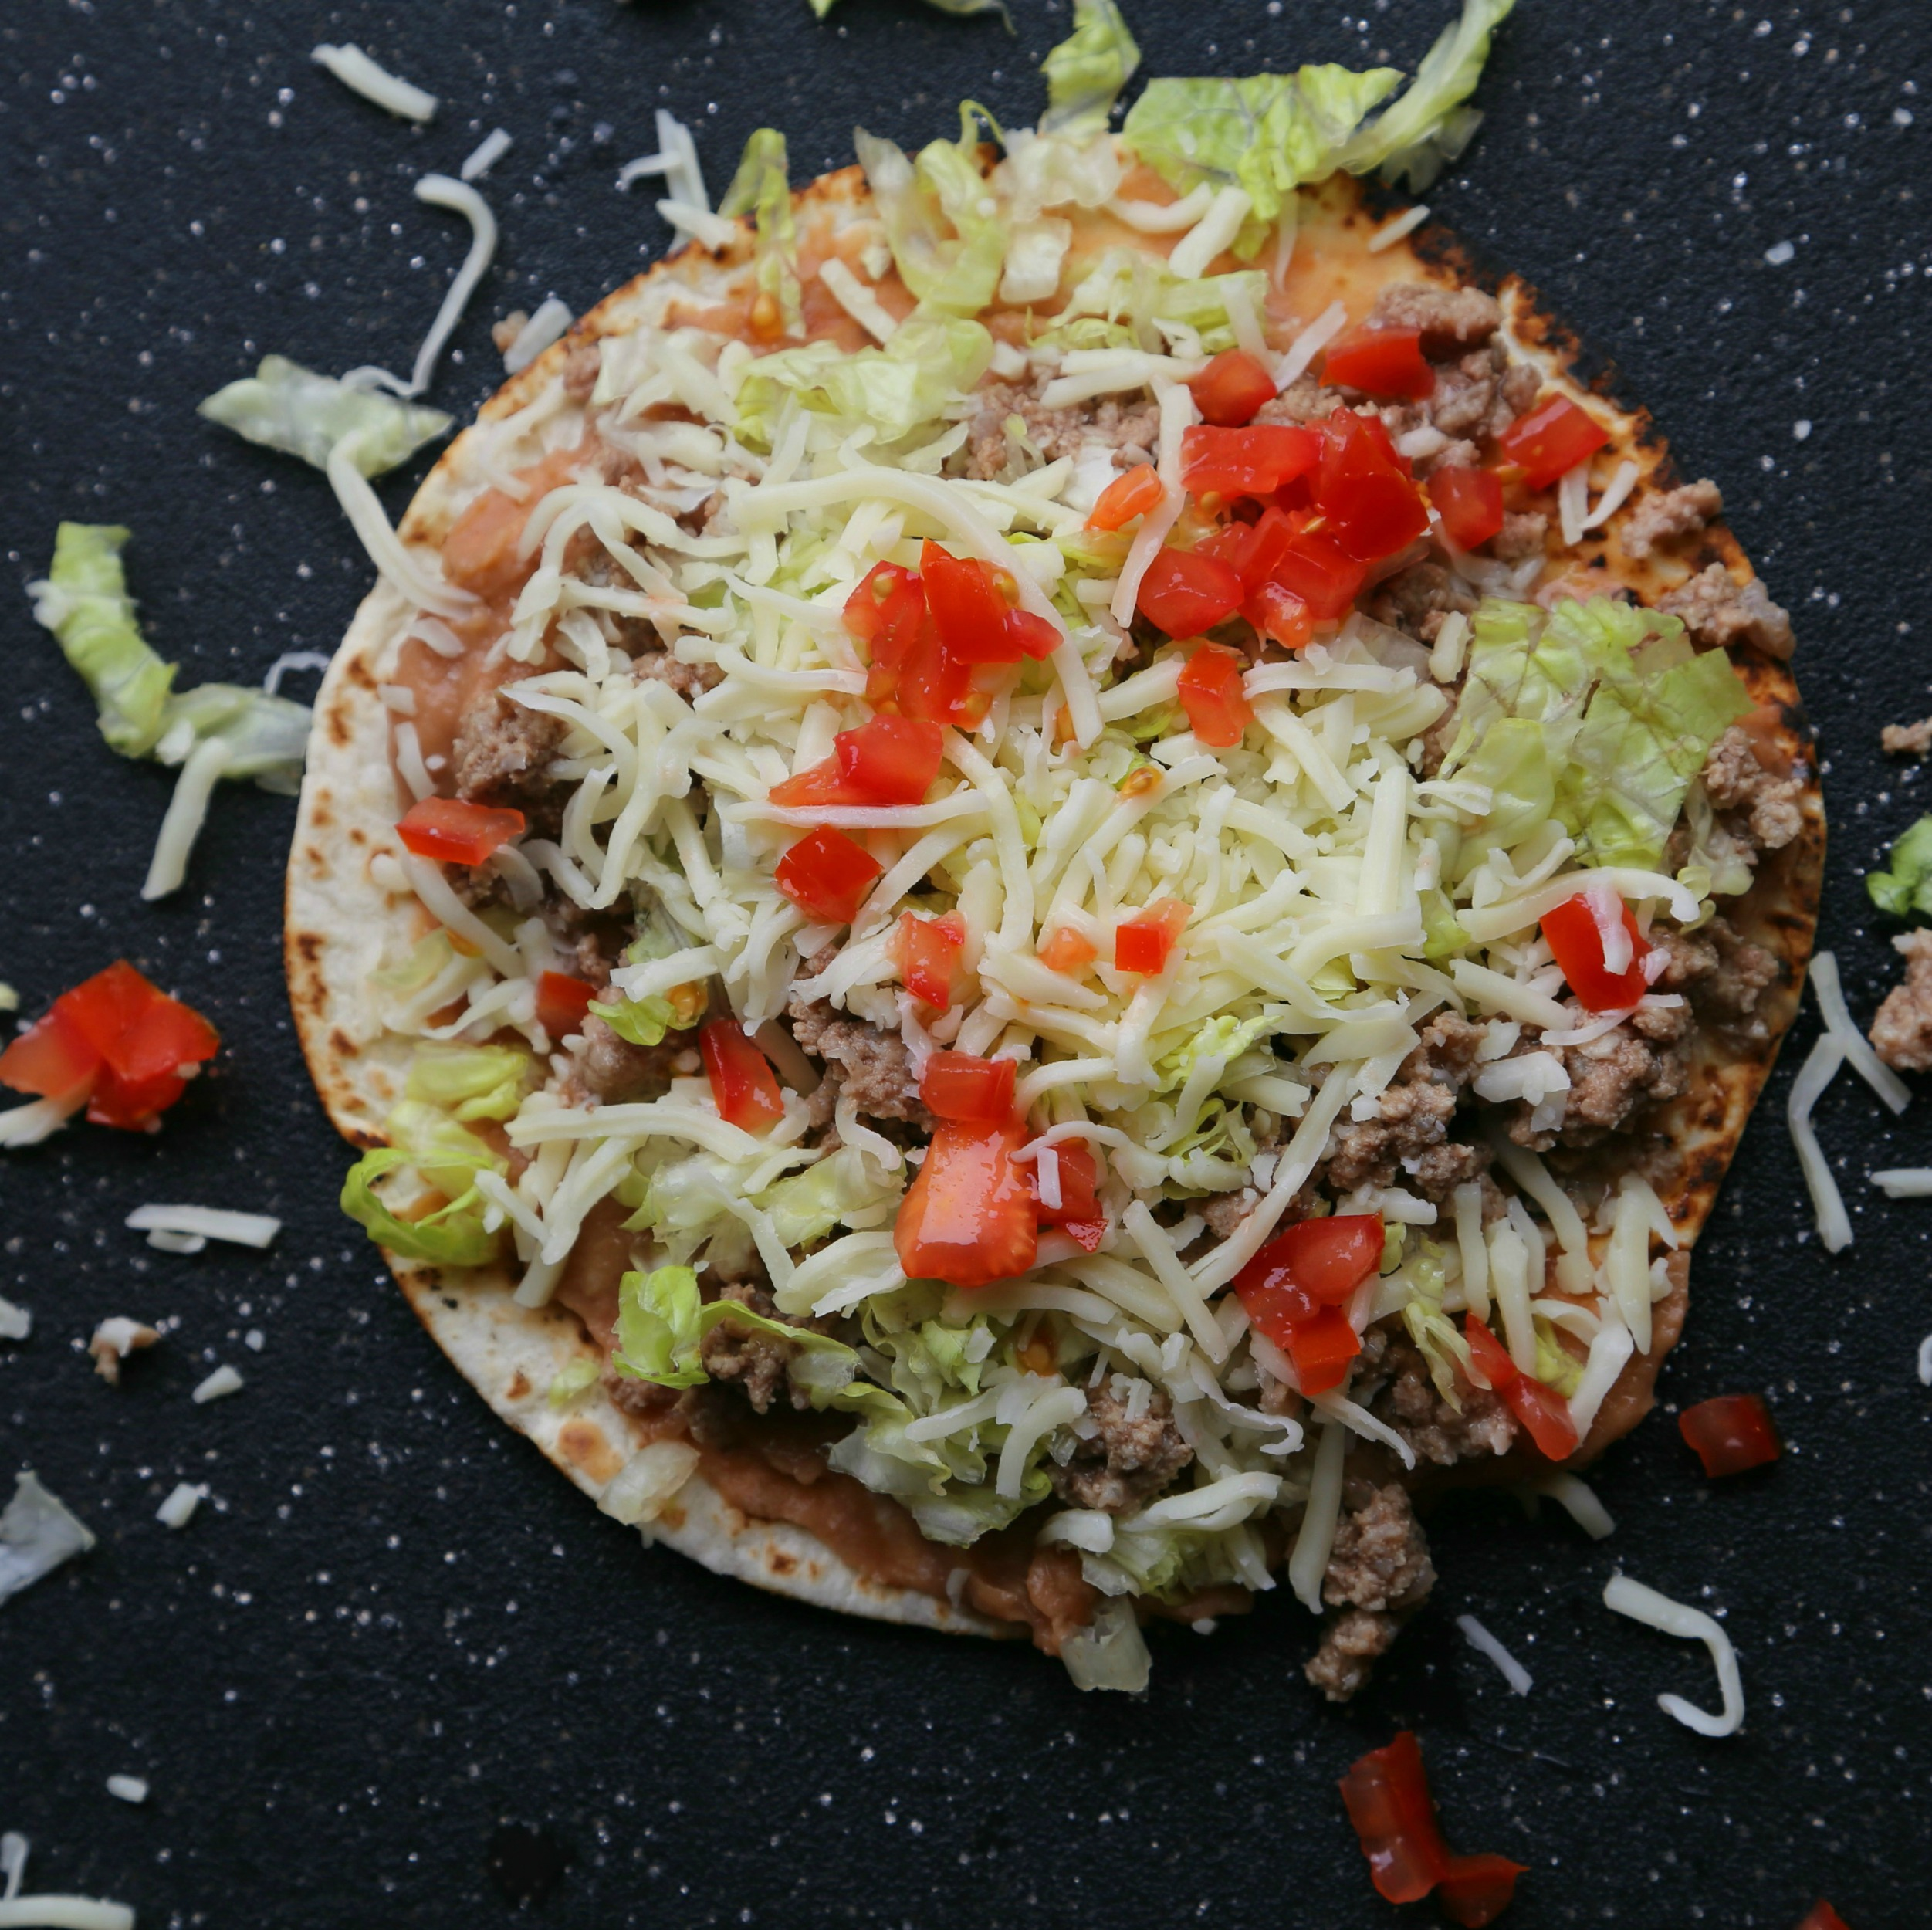 easy-mexican-pizza-VianneyRodriguez-sweetlifebake